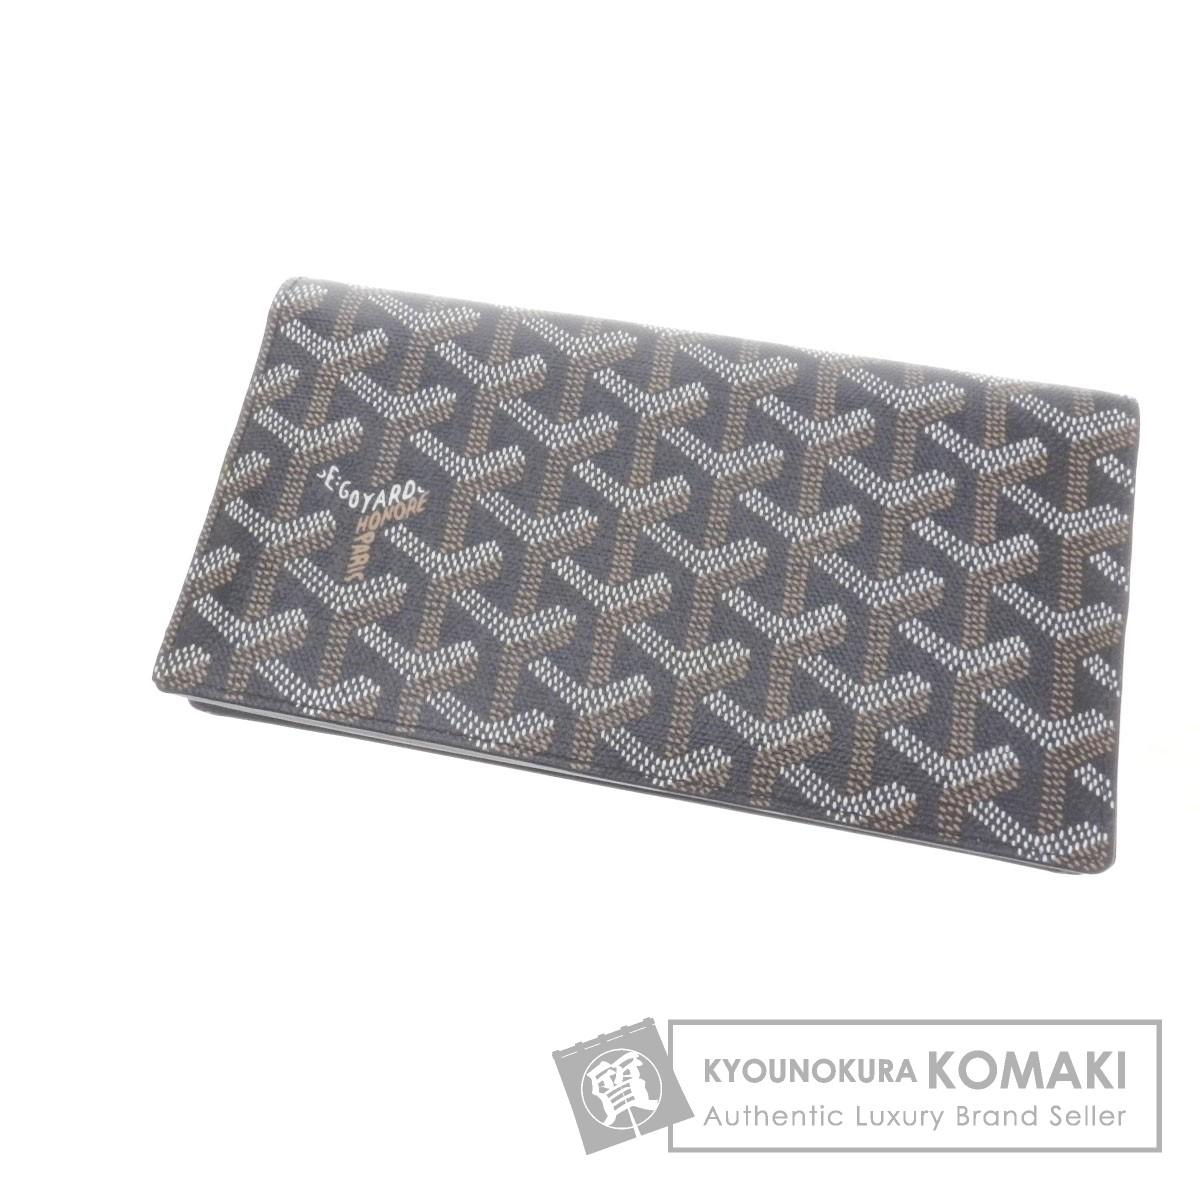 GOYARD サンルイ 長財布(小銭入れあり) PVC レディース 【中古】【ゴヤール】